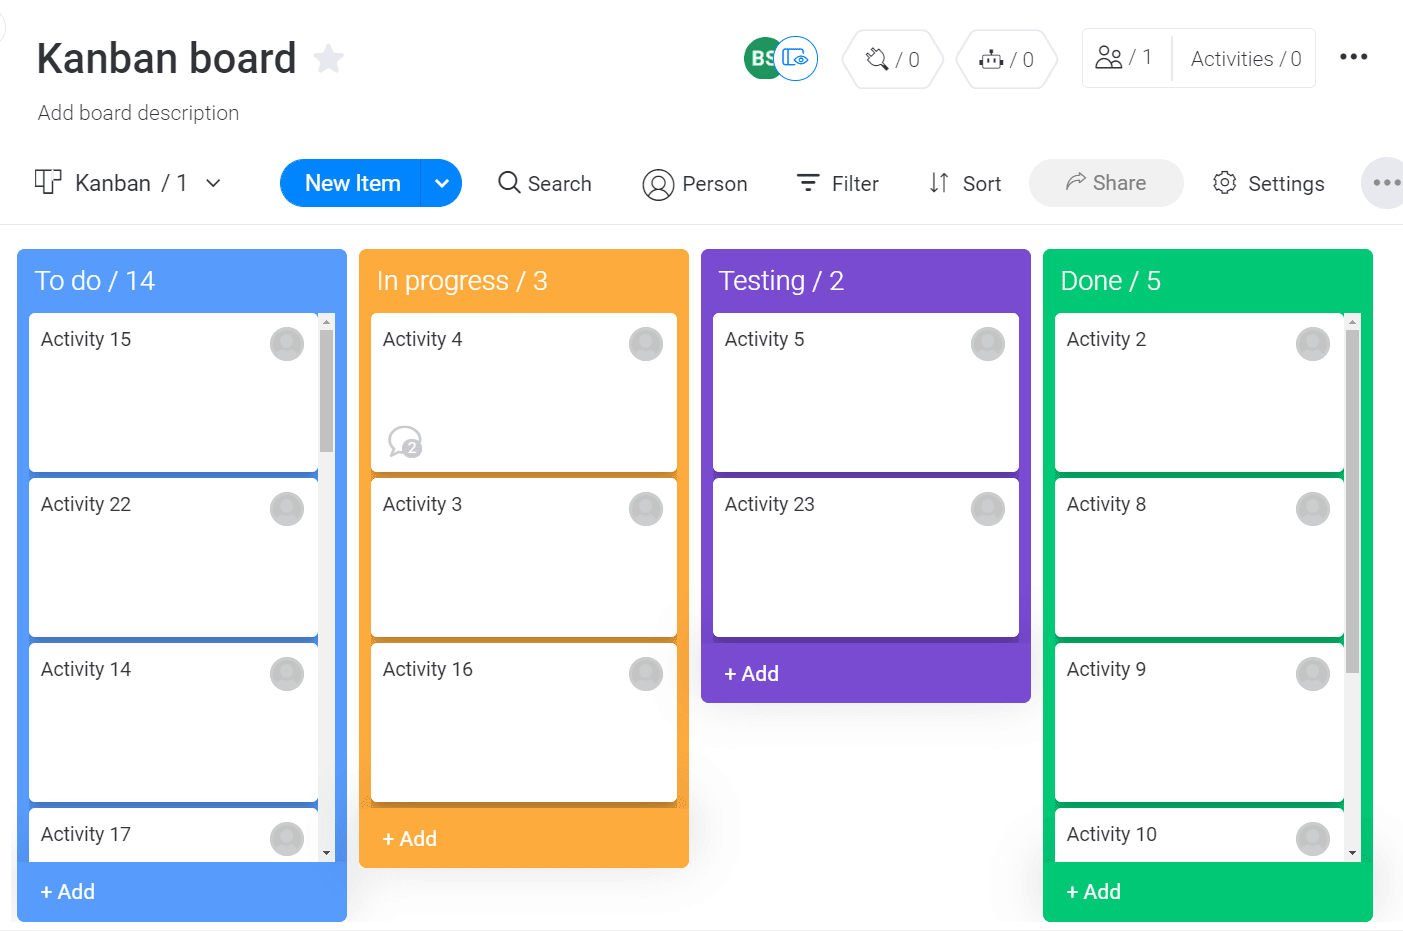 Screenshot of a kanban board in monday UI